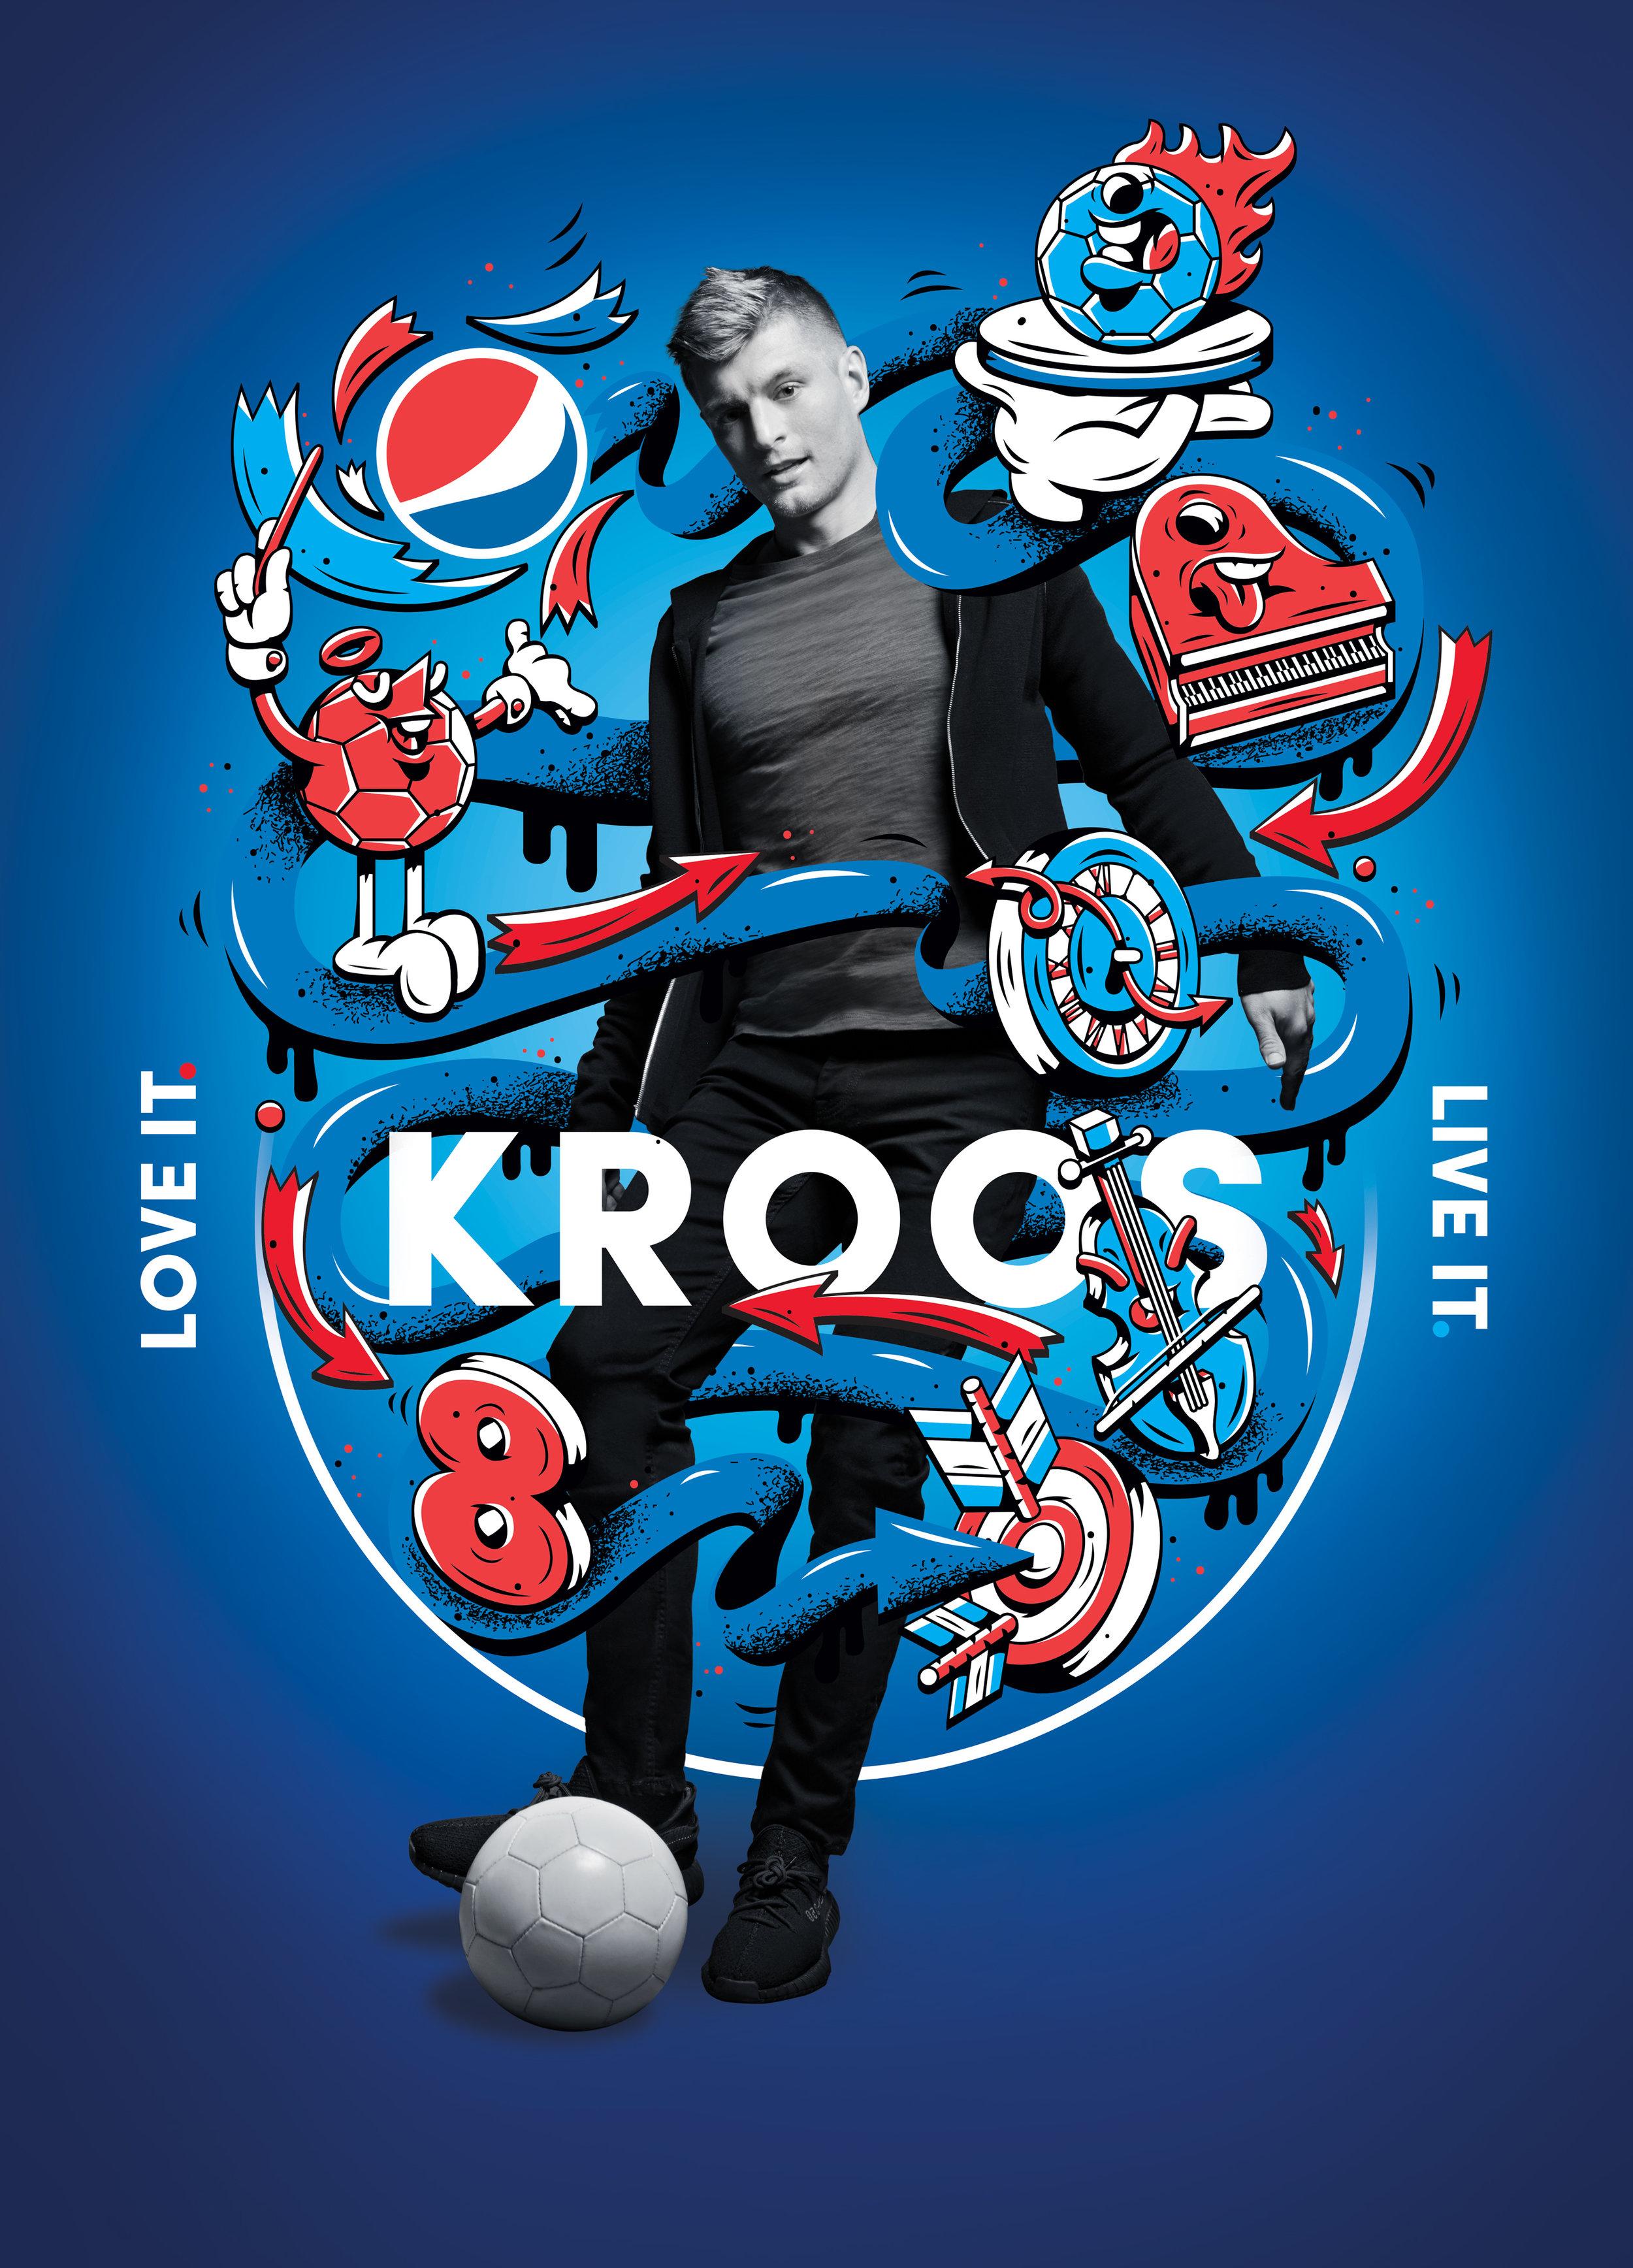 Pepsi Football 2018_Key Visual_Kroos_Portrait_No Branding.jpg